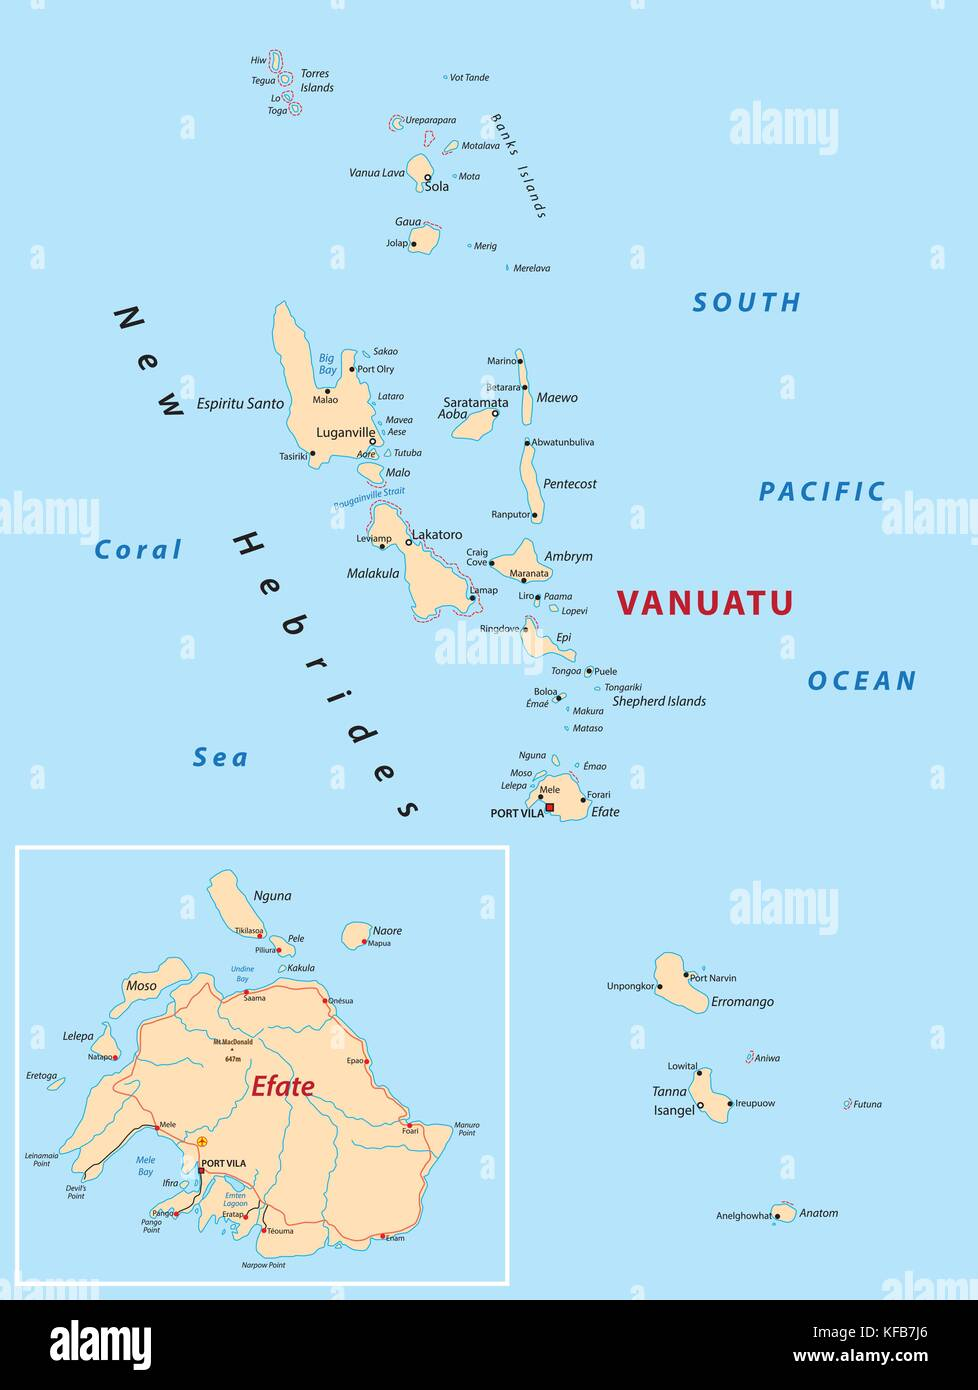 Vanuatu map stock vector art illustration vector image 164360622 vanuatu map gumiabroncs Image collections